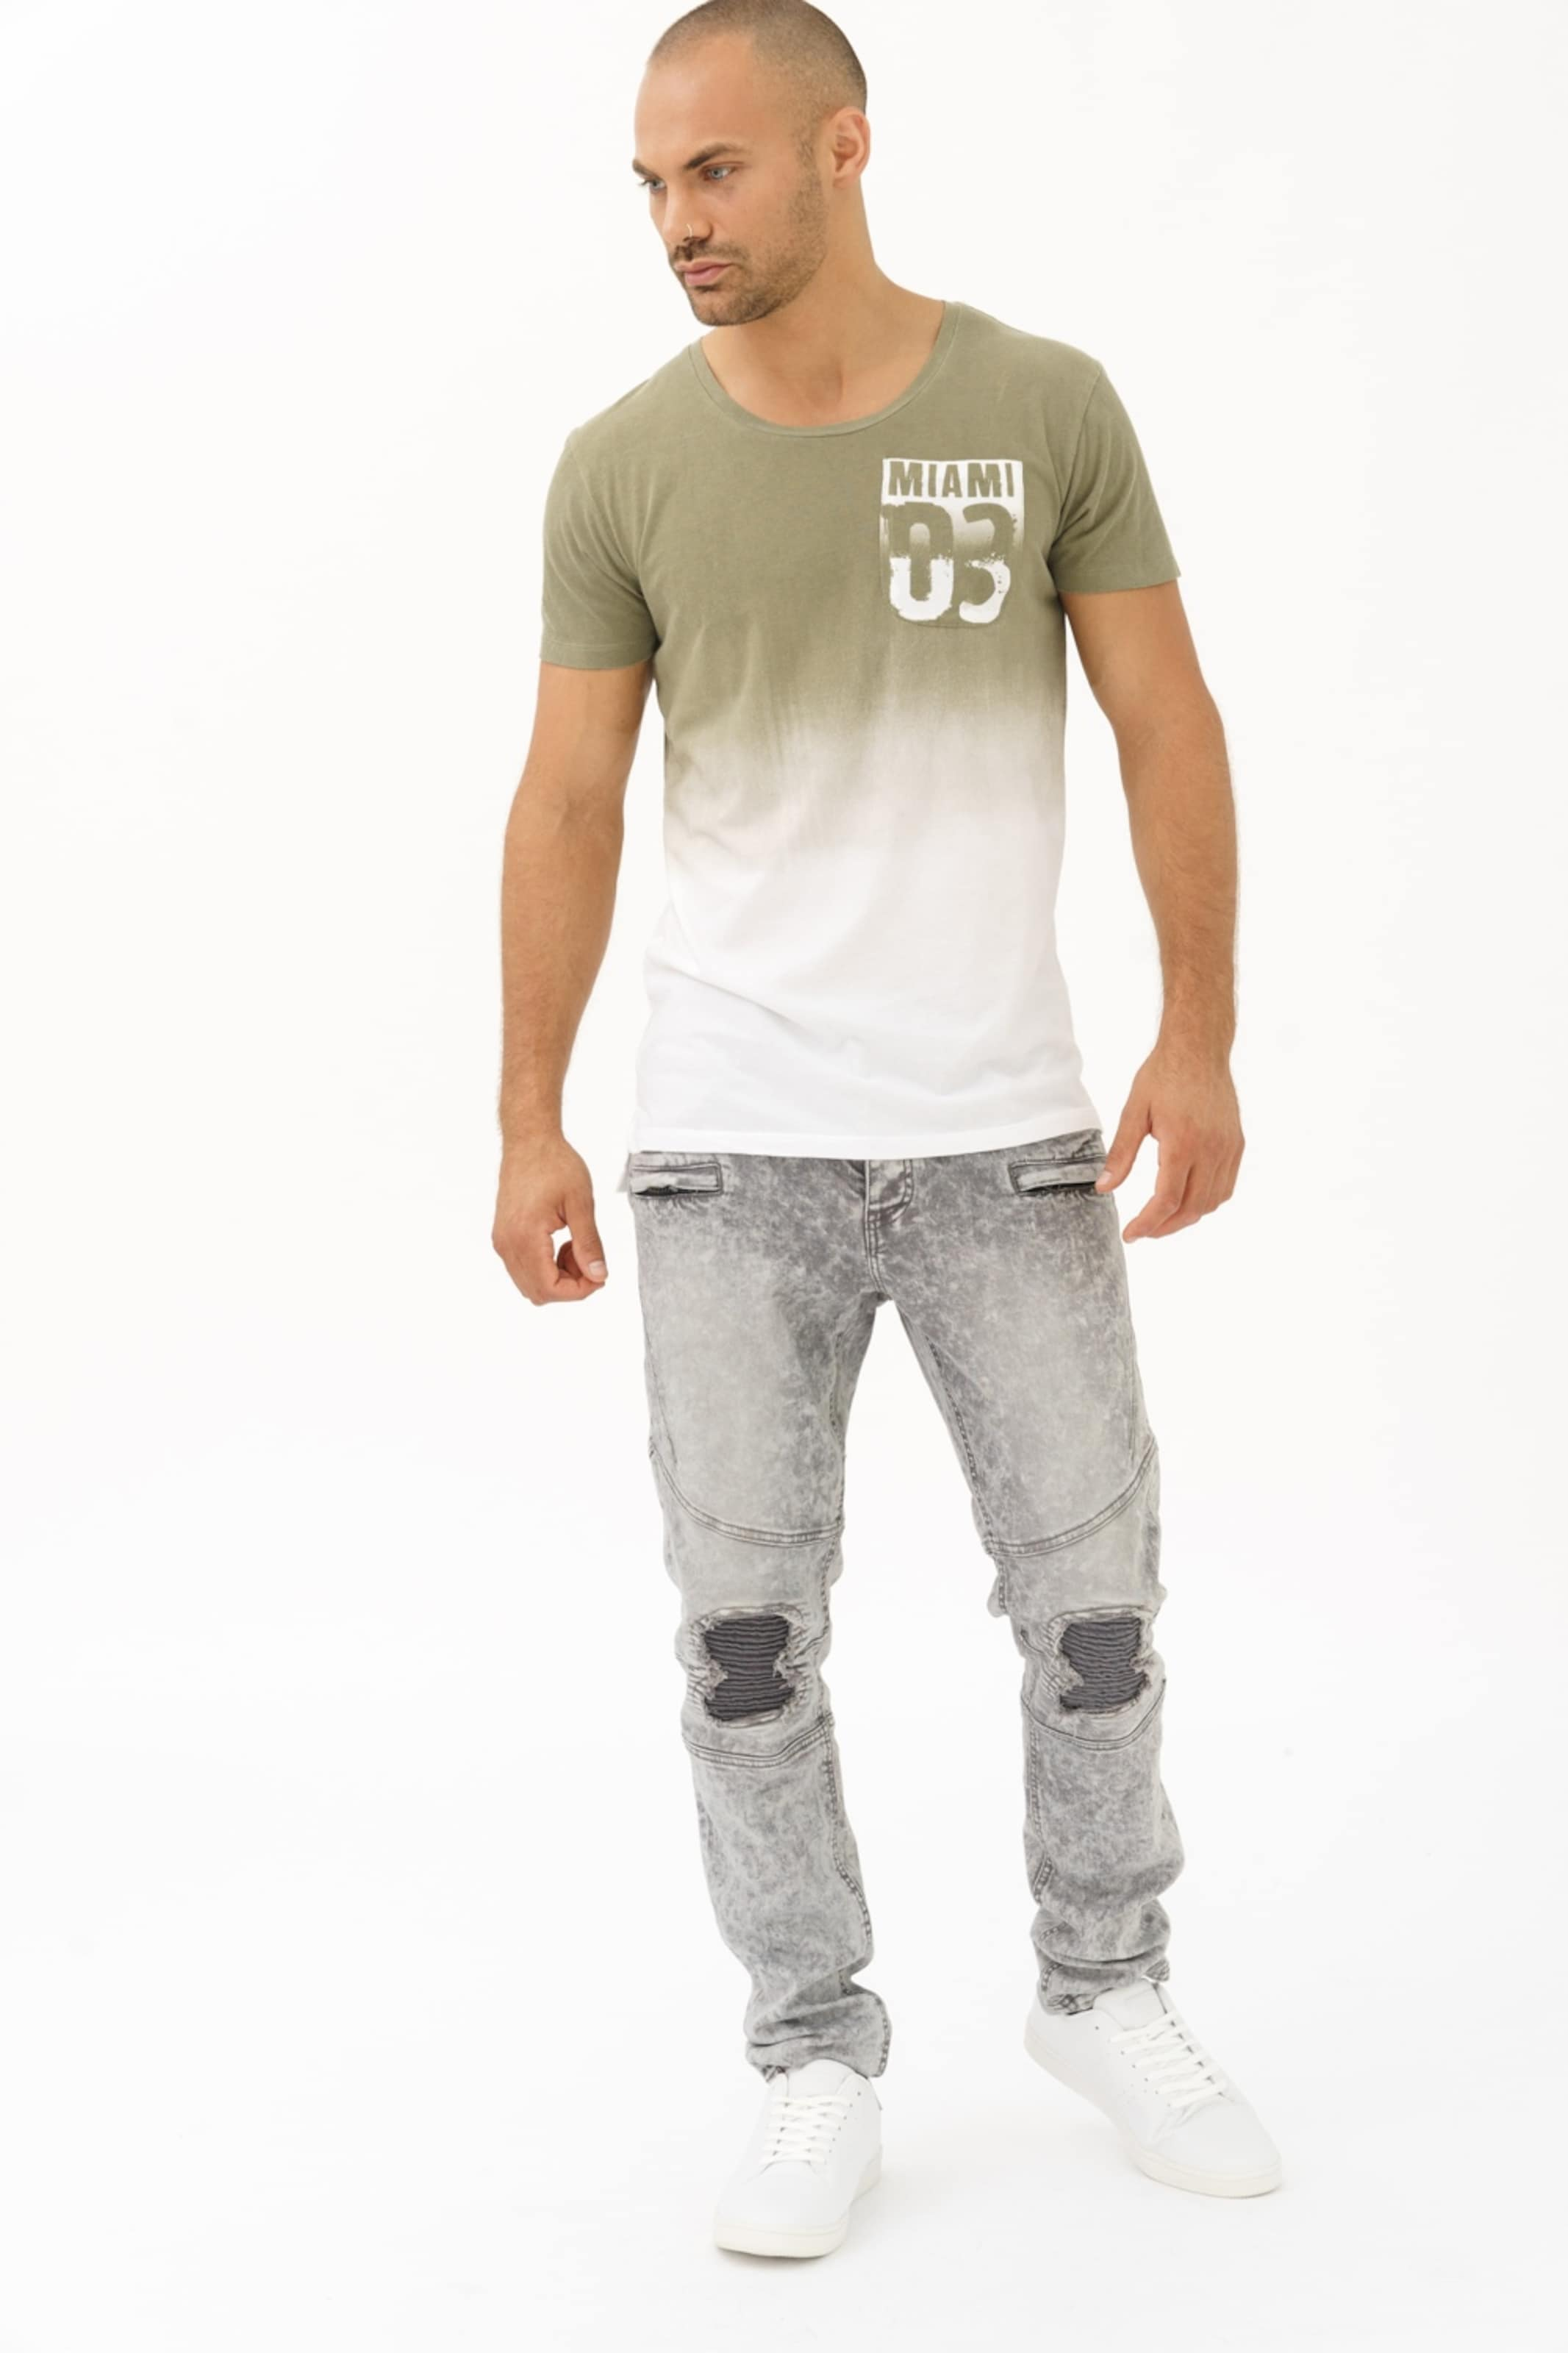 Trueprodigy In Khaki shirt Khaki Trueprodigy shirt In Trueprodigy T T uOkiXPZ